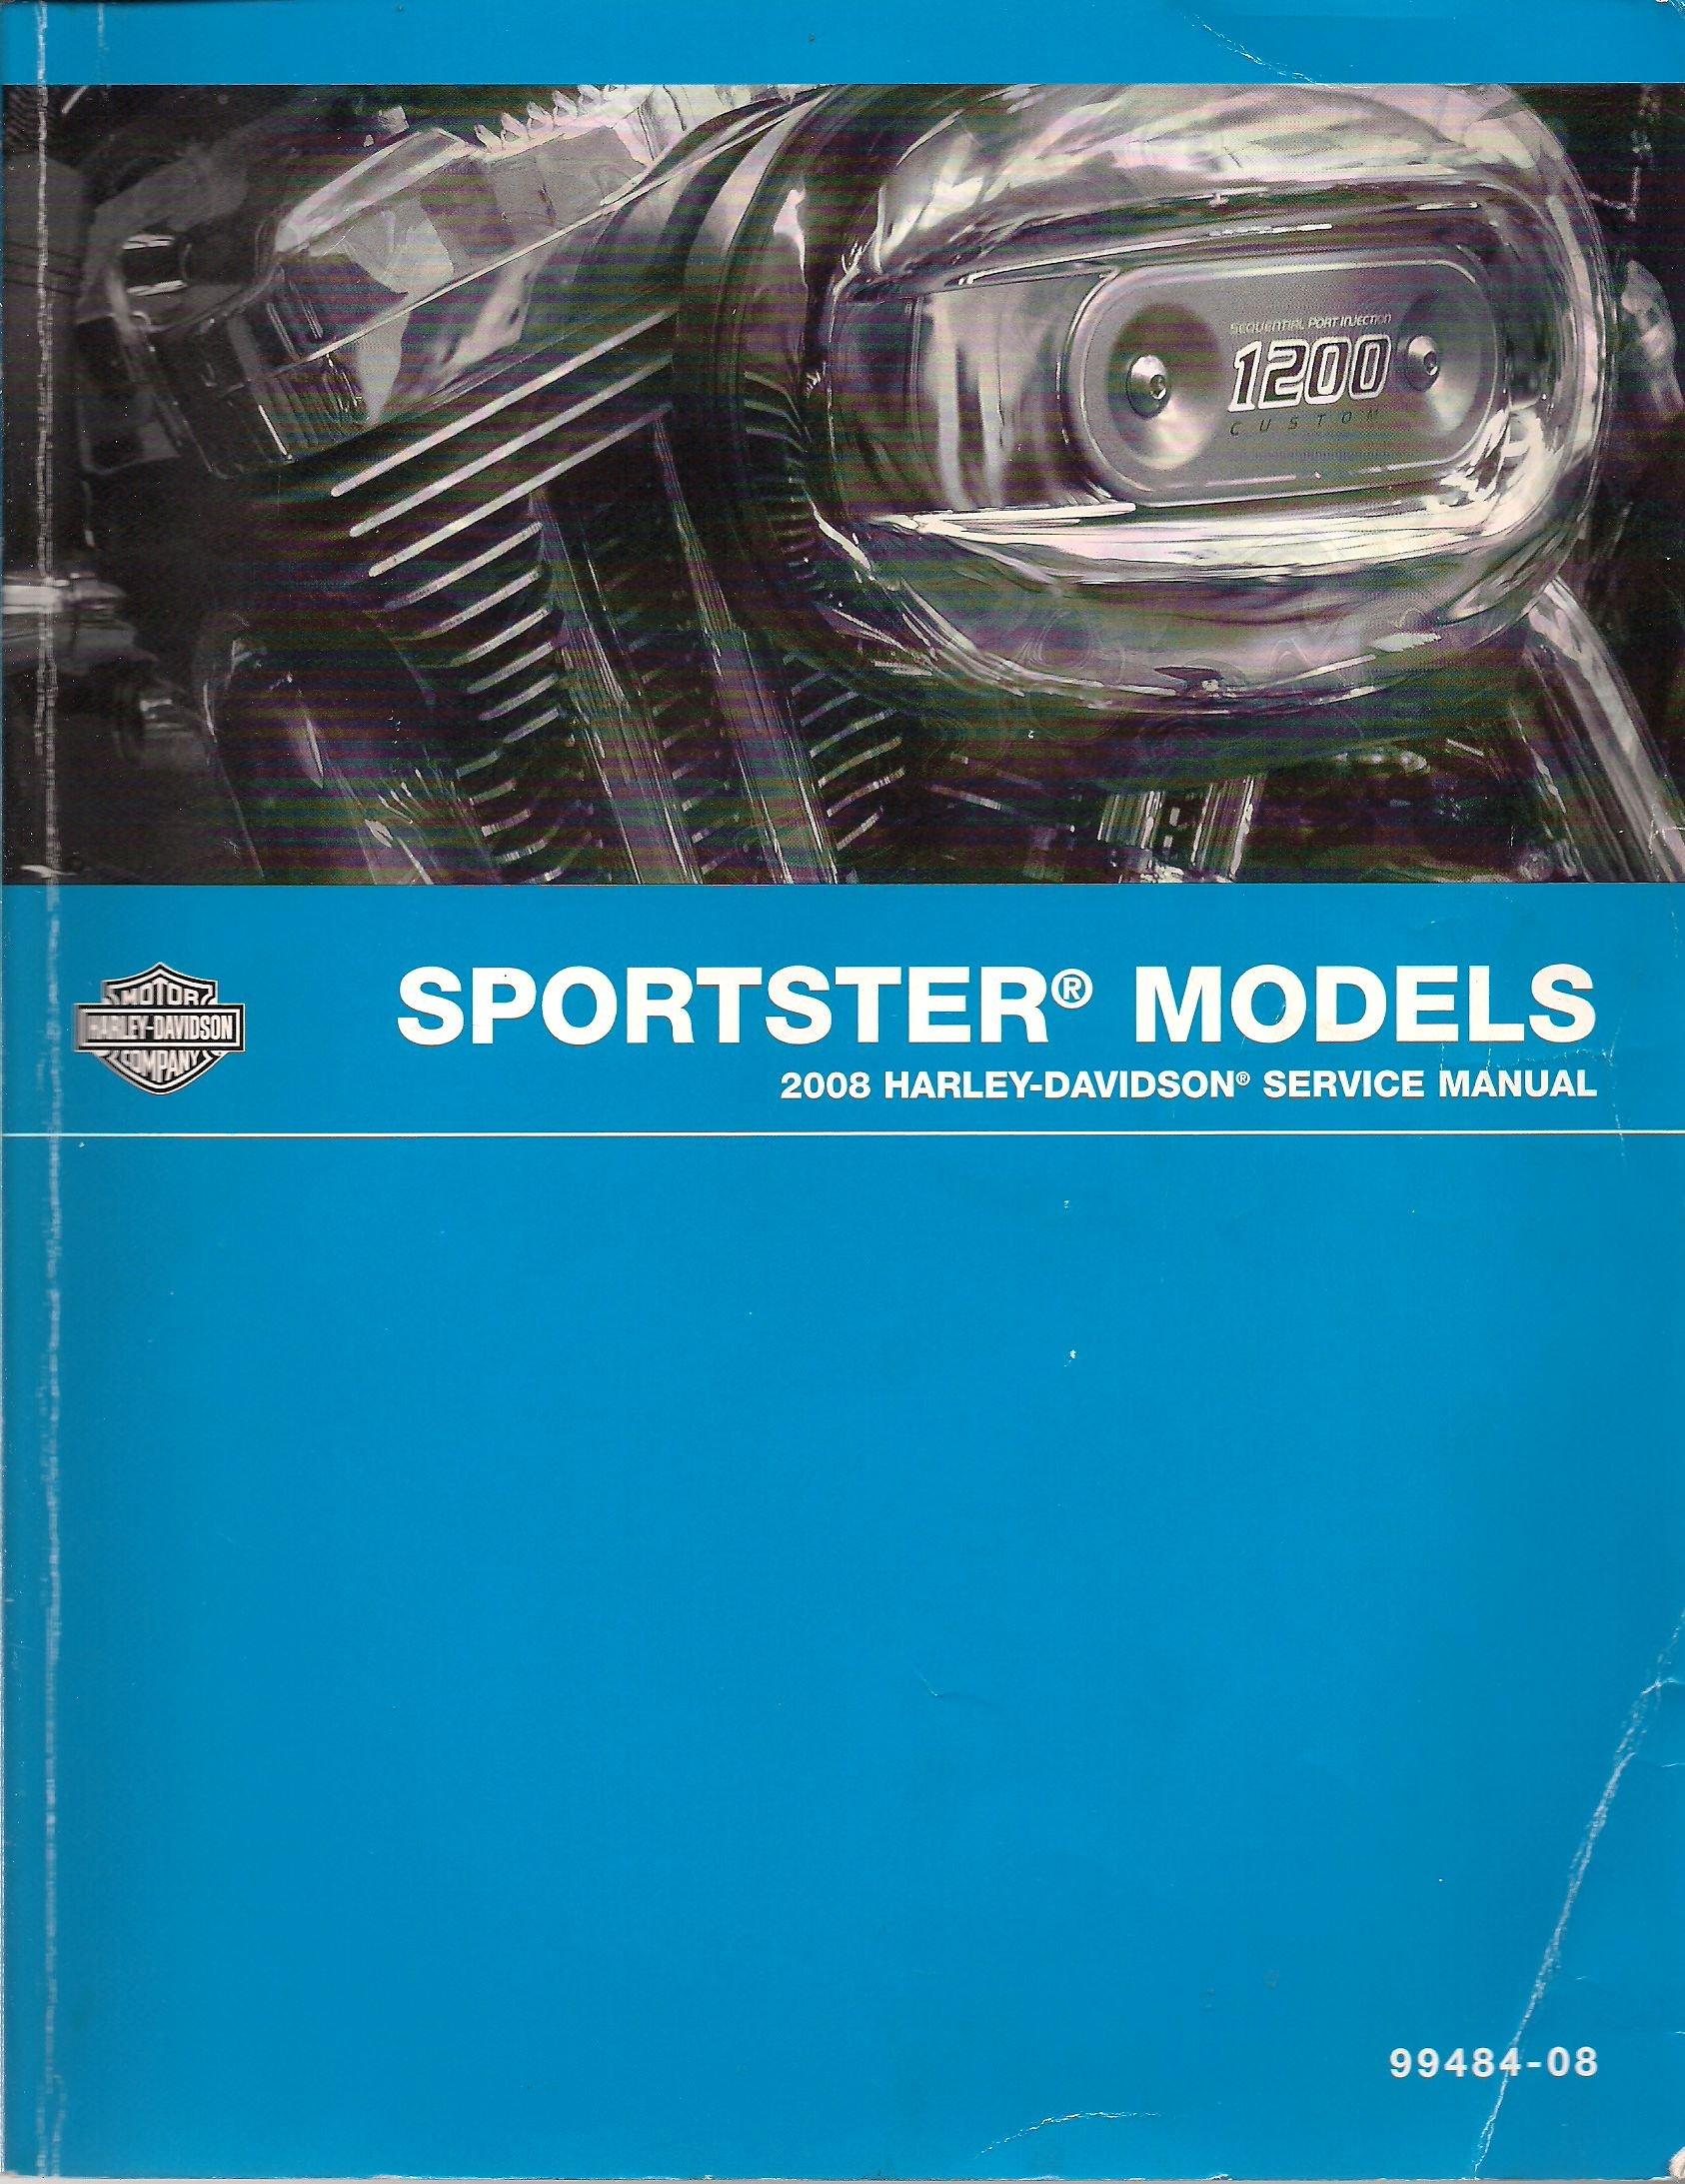 2008 Sportster Models Service Manual: Harley-Davidson Motor Company:  Amazon.com: Books